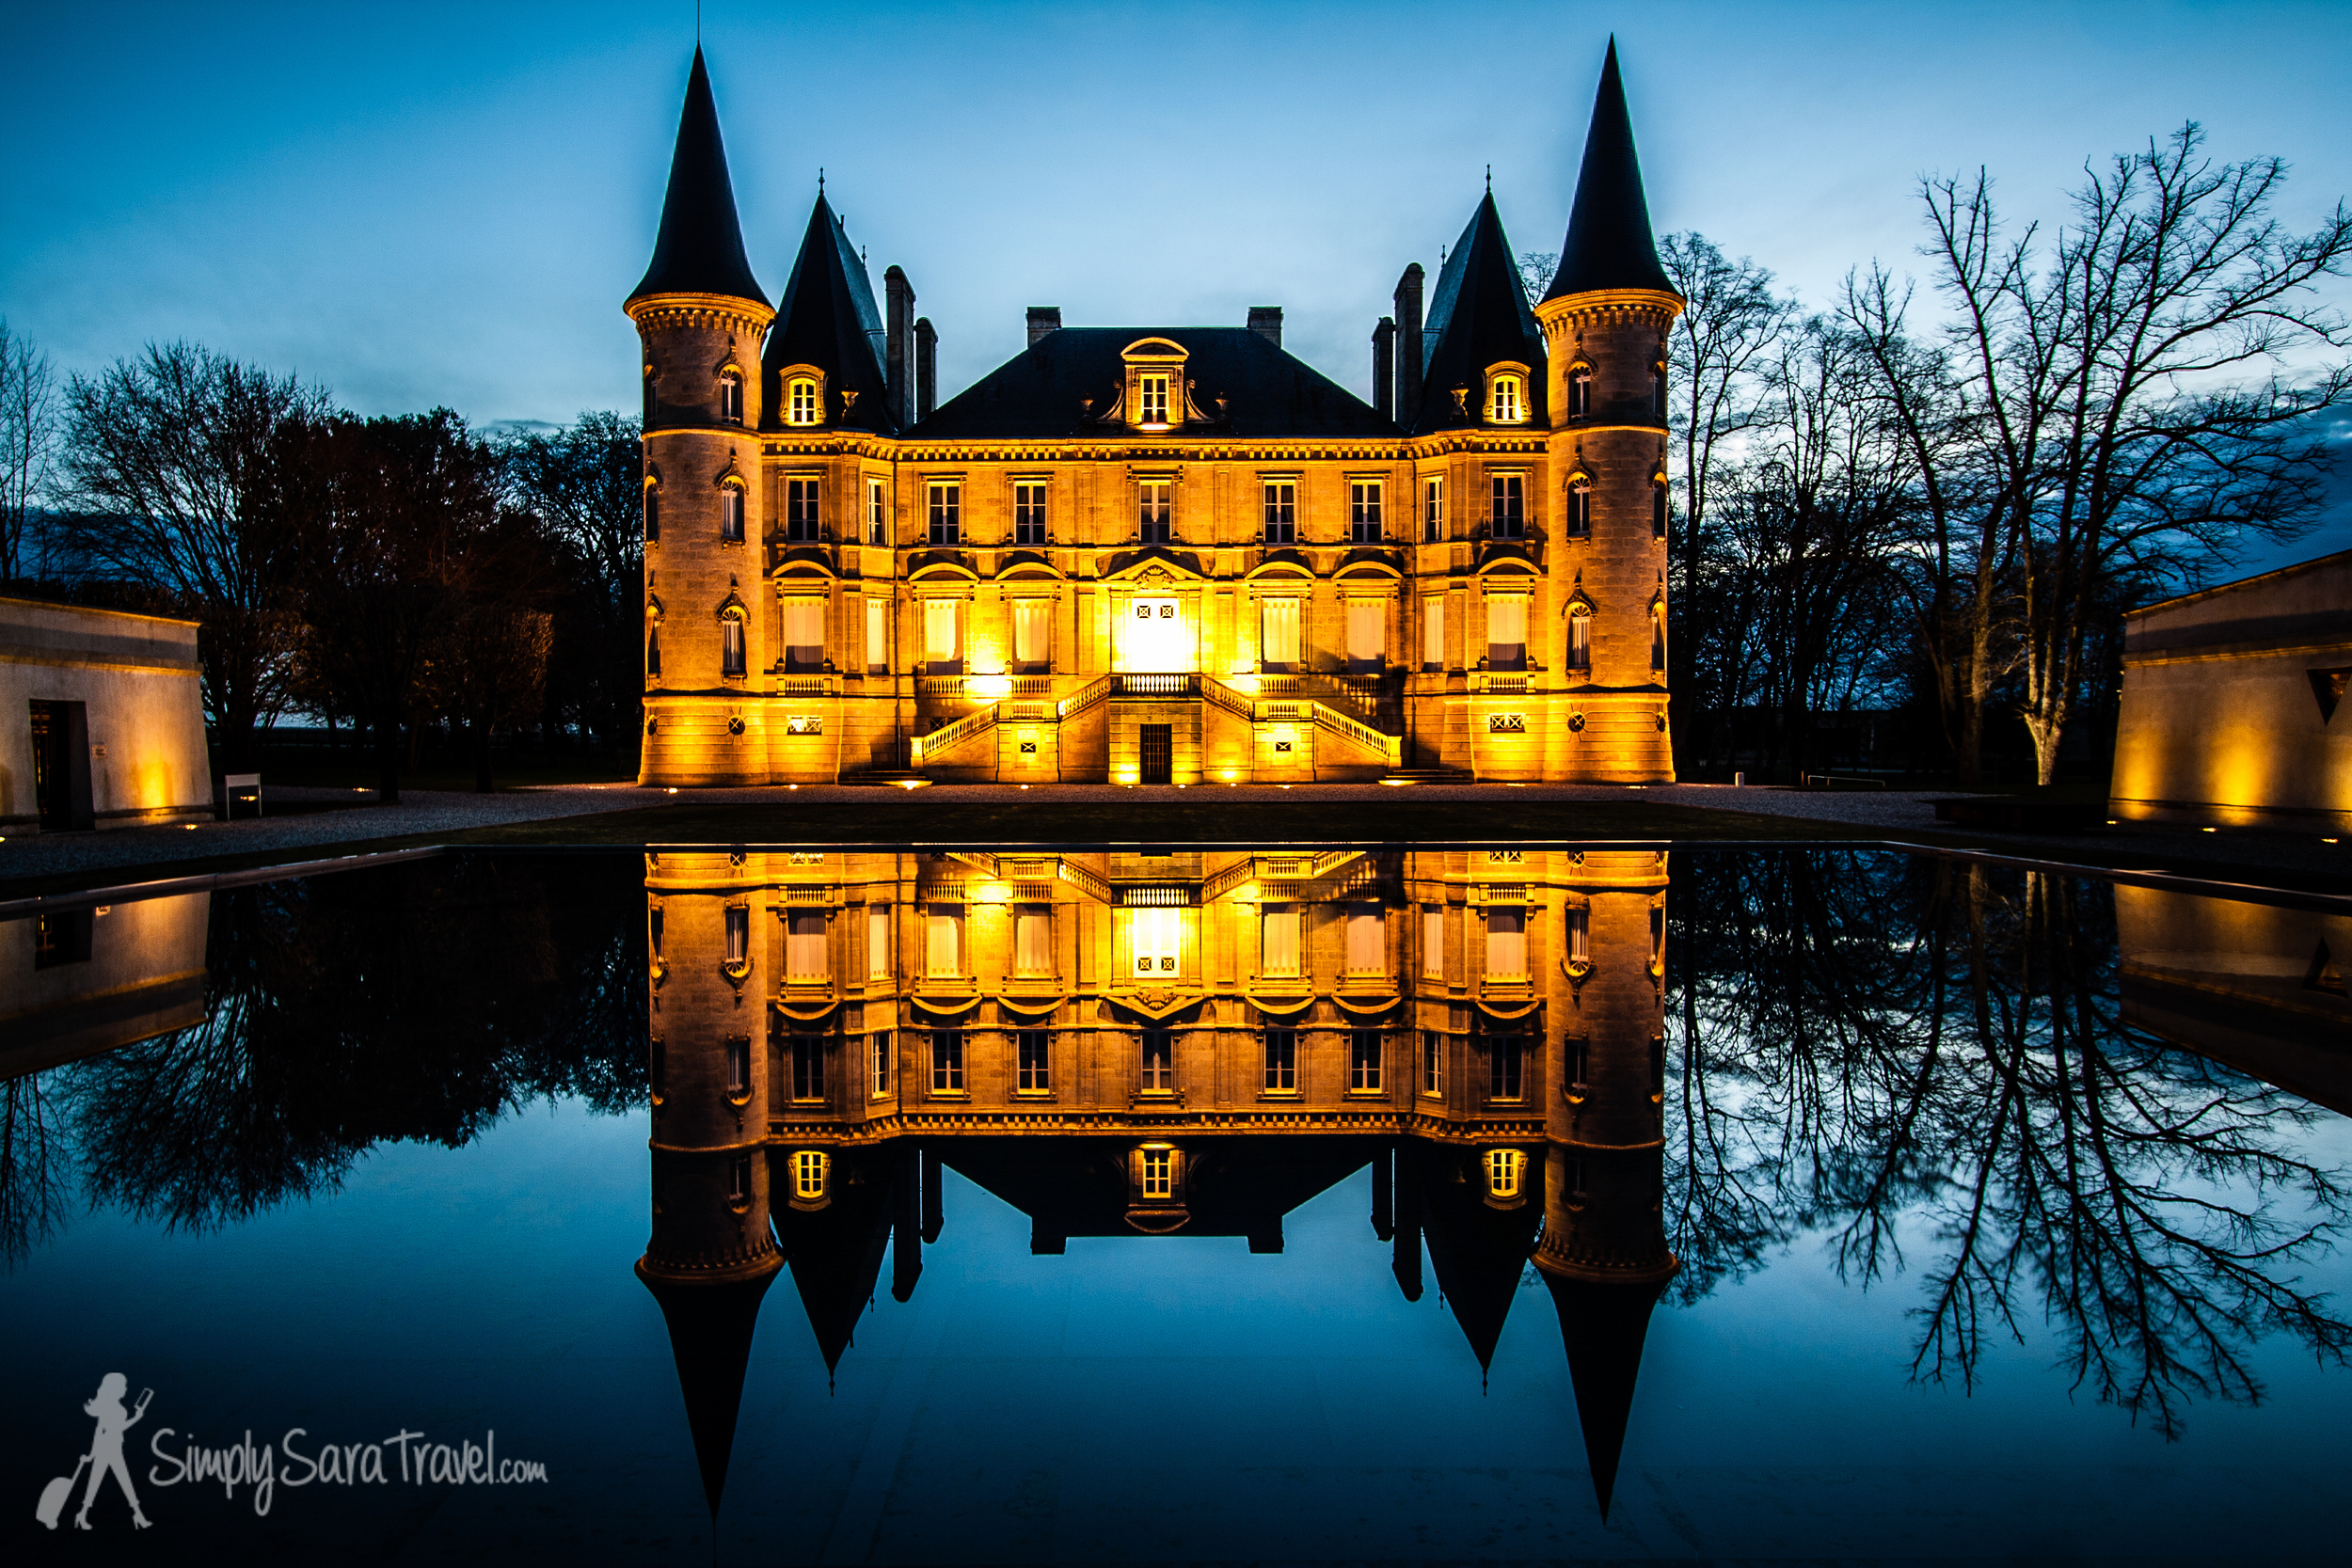 Château Pichon Longueville  lit up at night, one of the most beautiful châteaus on La Route des Châteaux (D2) north of Bordeaux (March 2013)